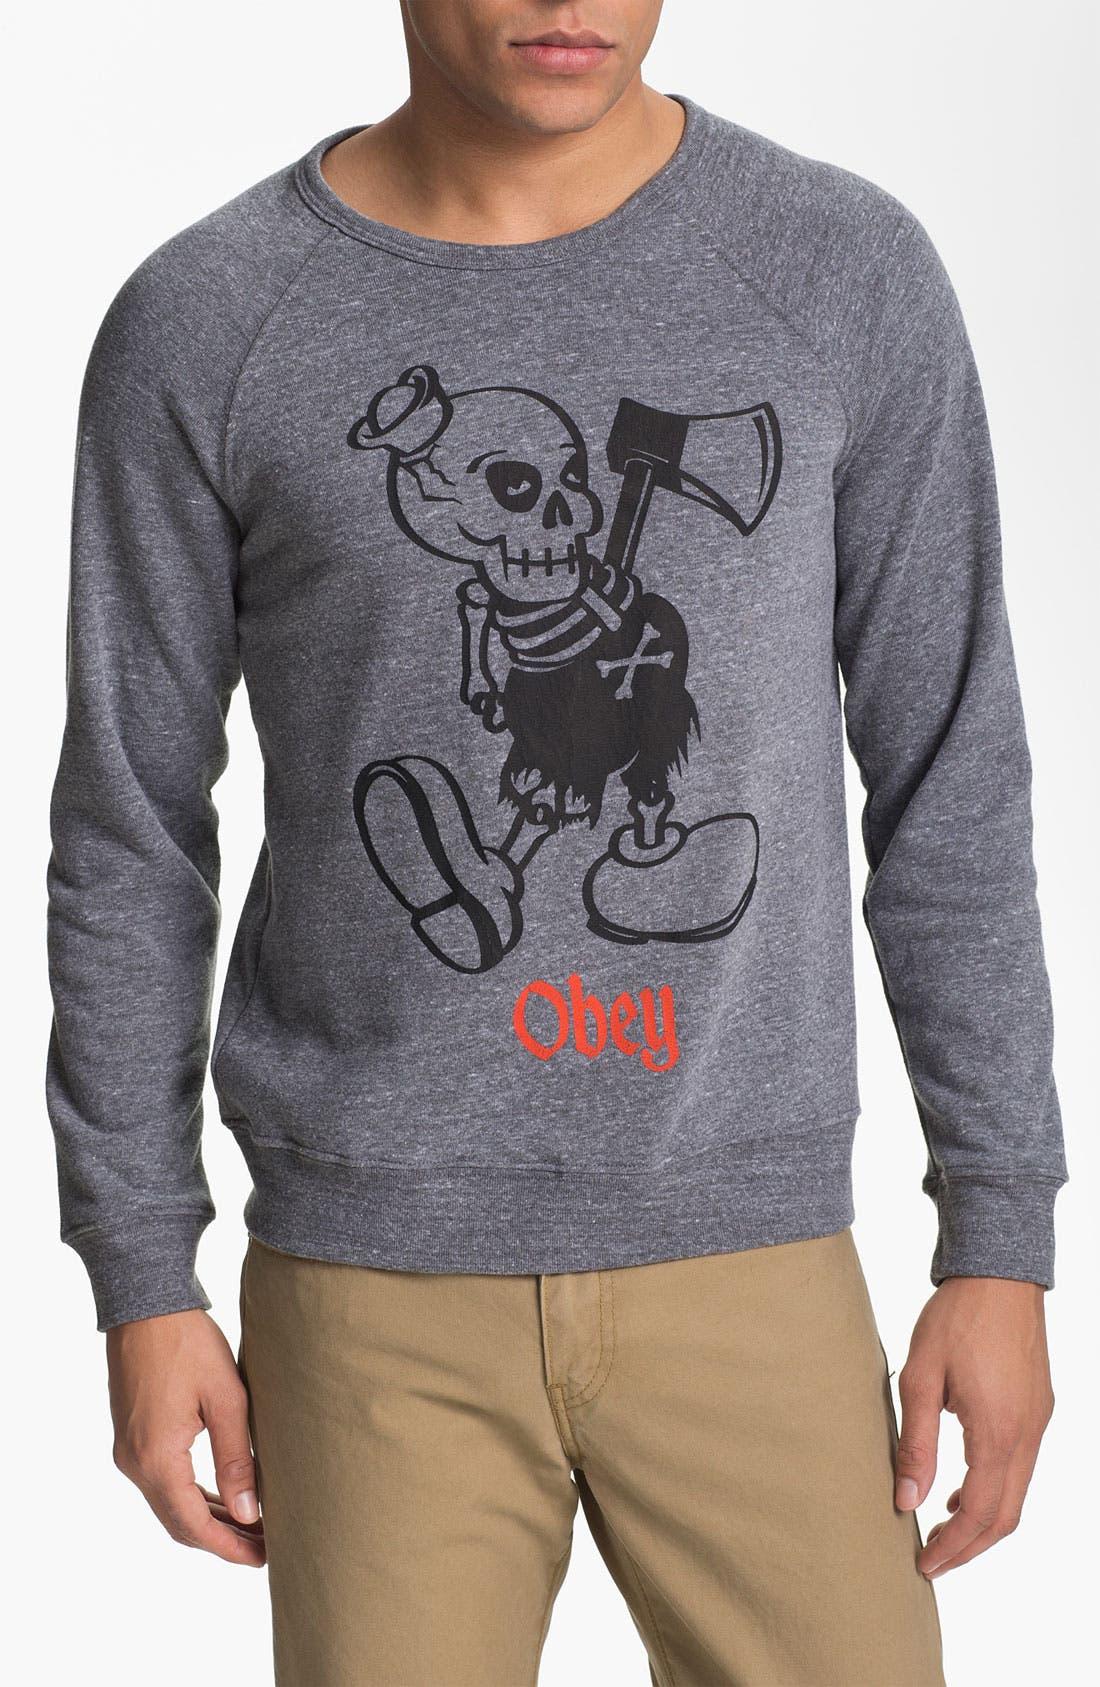 Alternate Image 1 Selected - Obey 'Oh Boy' Graphic Crewneck Sweatshirt